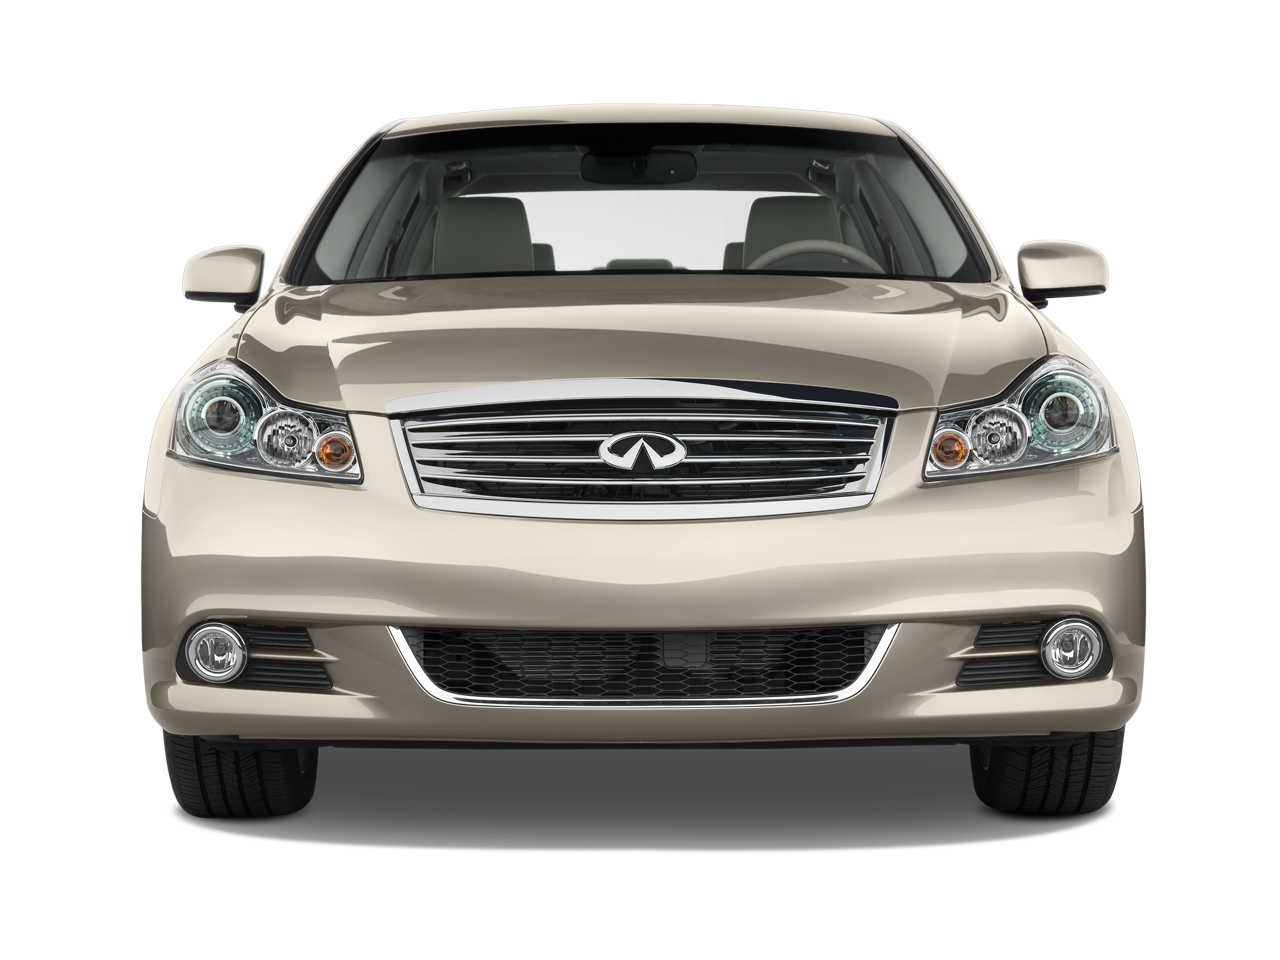 2009 infiniti m m35 m35x m45 m45x midsize sedans